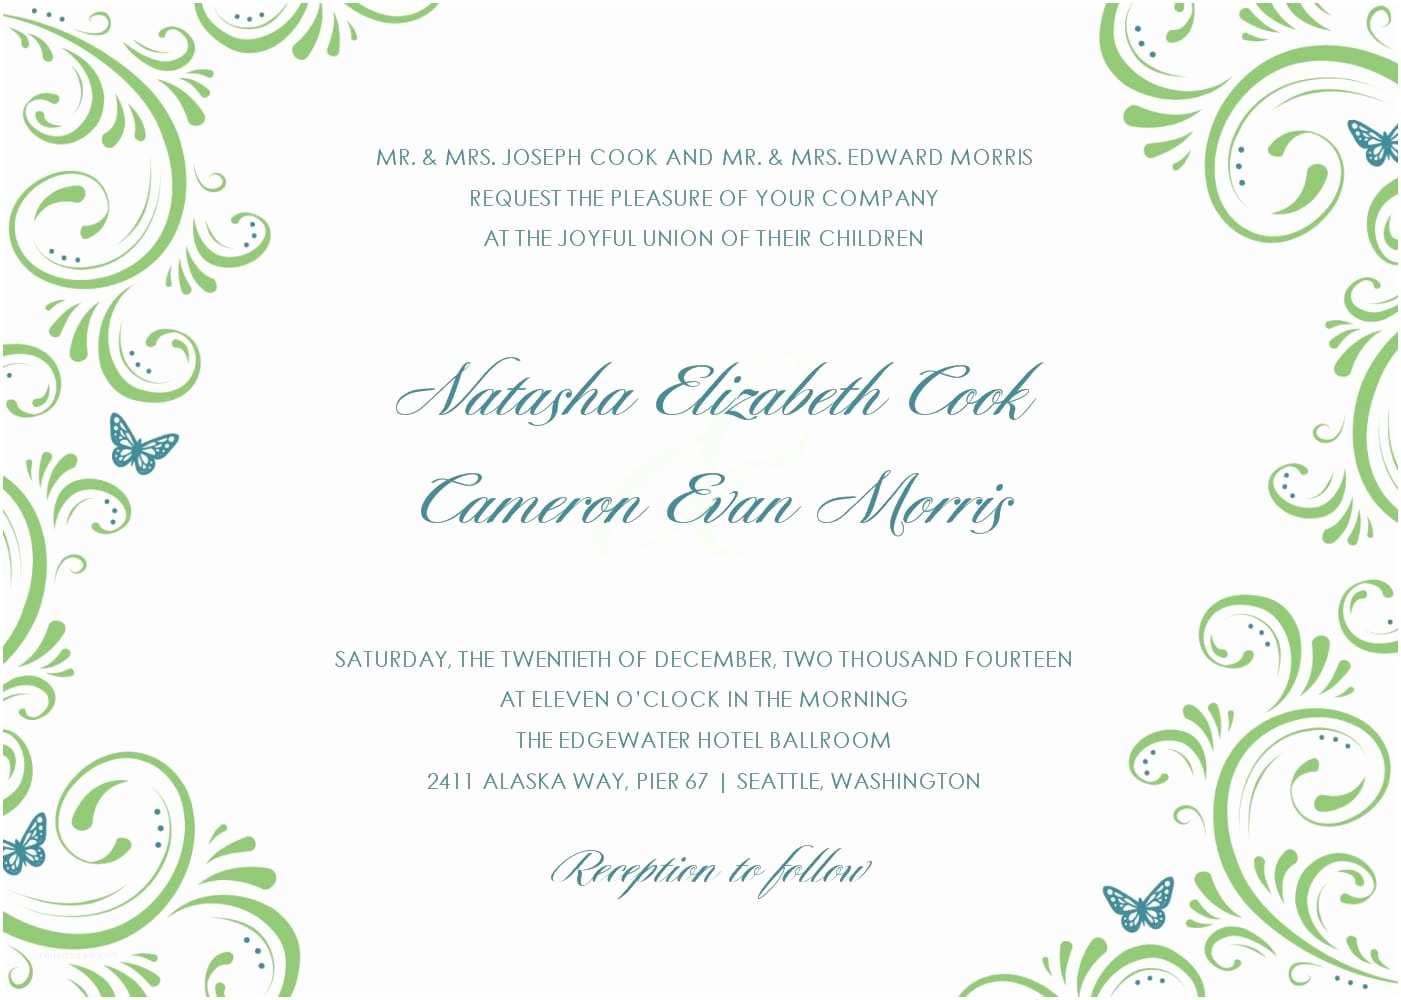 Free Printable Wedding Invitations Templates Downloads Wedding Invitation Templates Free Download – Gangcraft